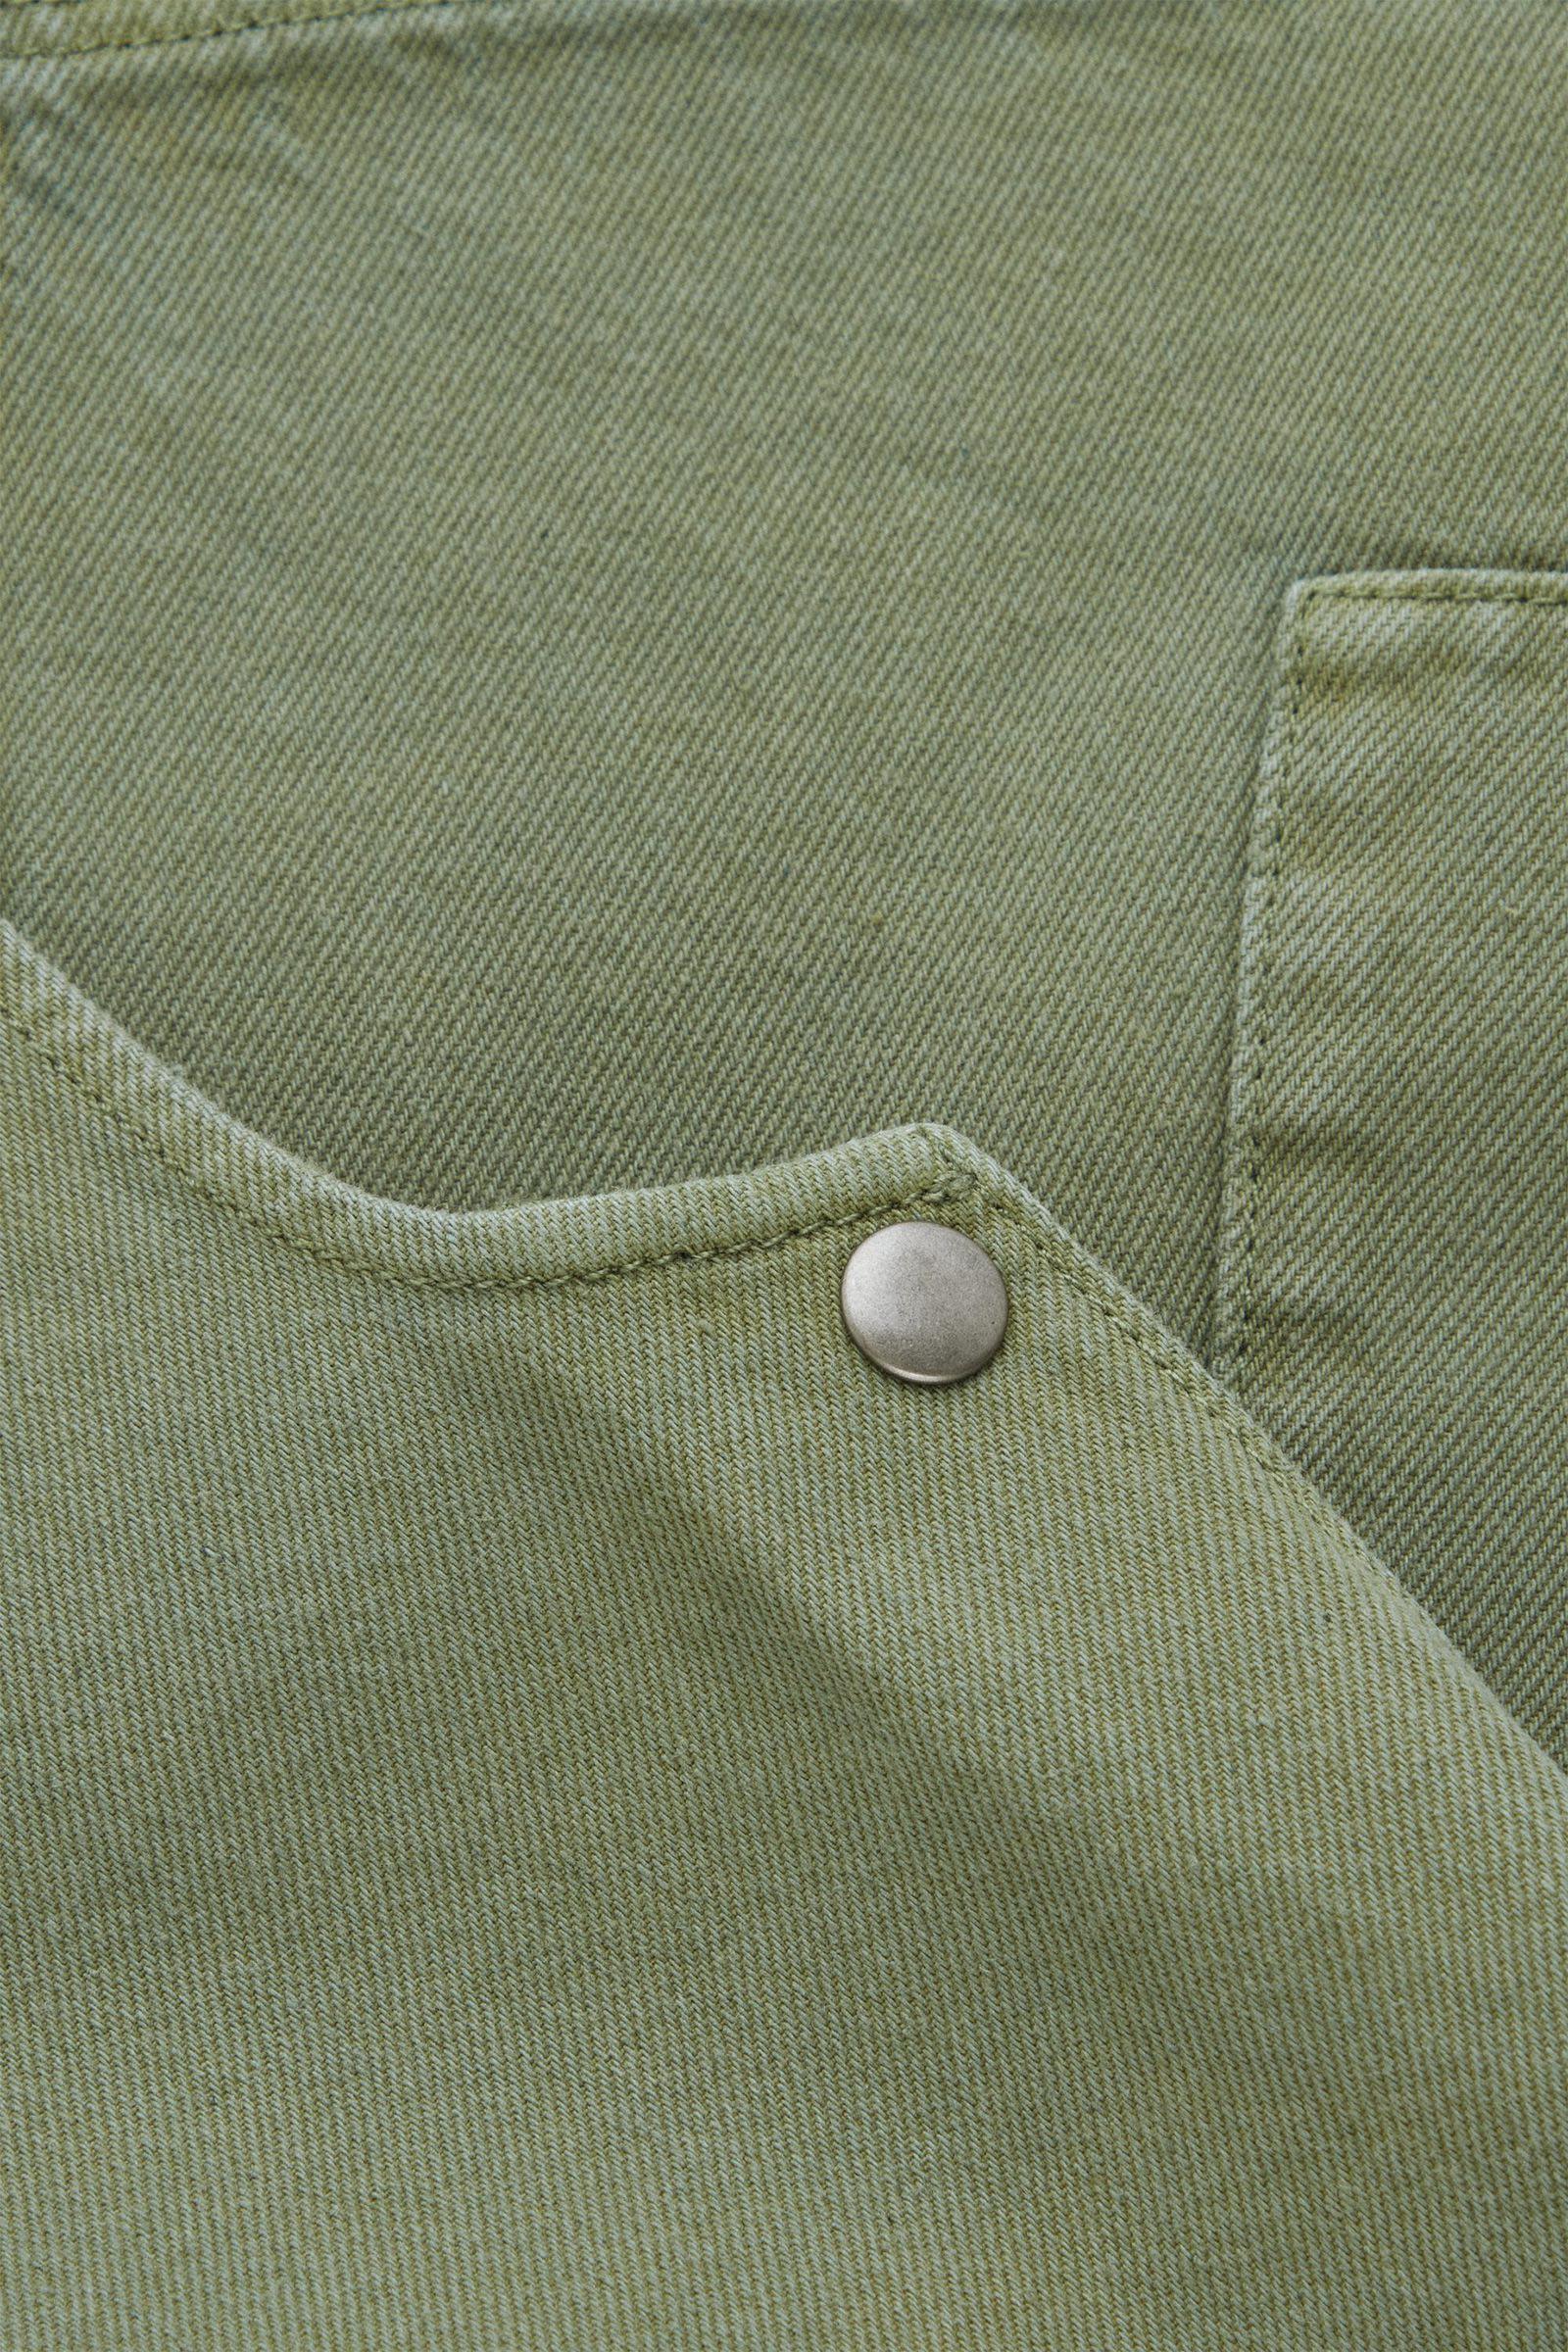 COS 오가닉 코튼 피나포어 드레스의 카키 그린컬러 Detail입니다.